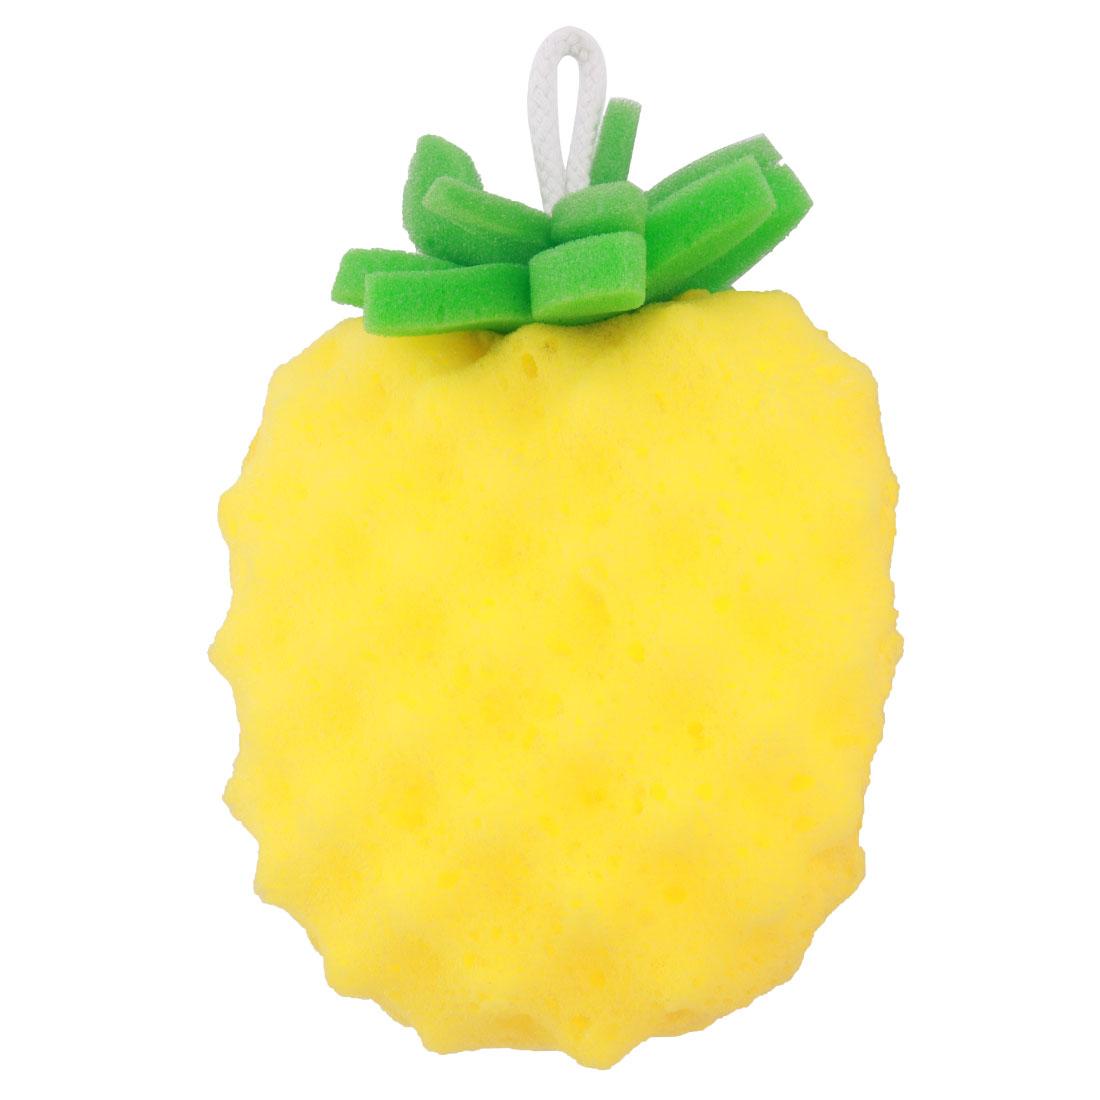 Home Bathroom Sponge Pineapple Shaped Body Cleaning Washing Bath Shower Ball Pouf